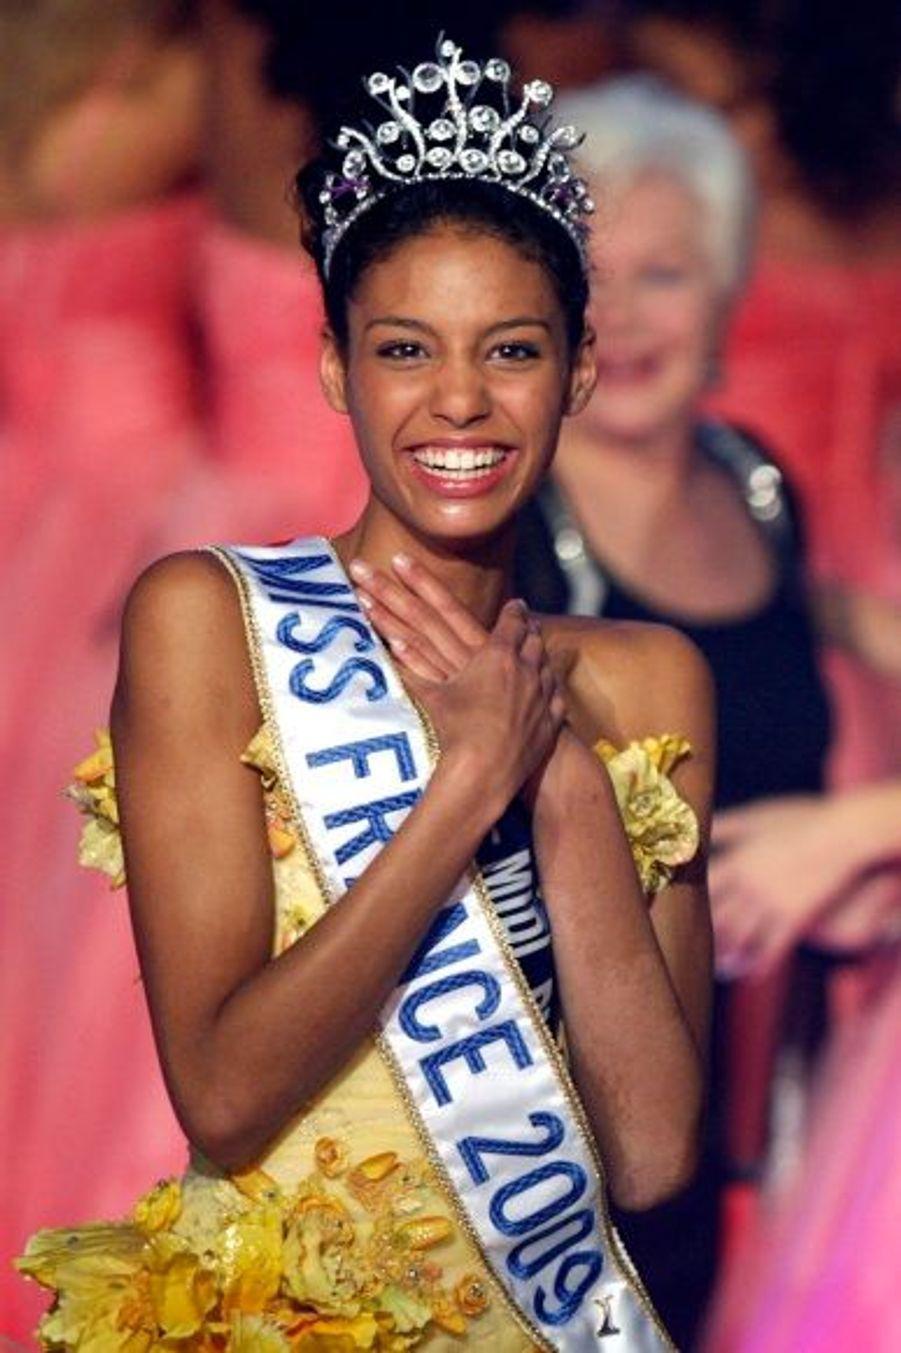 Chloé Mortaud, Miss France 2009